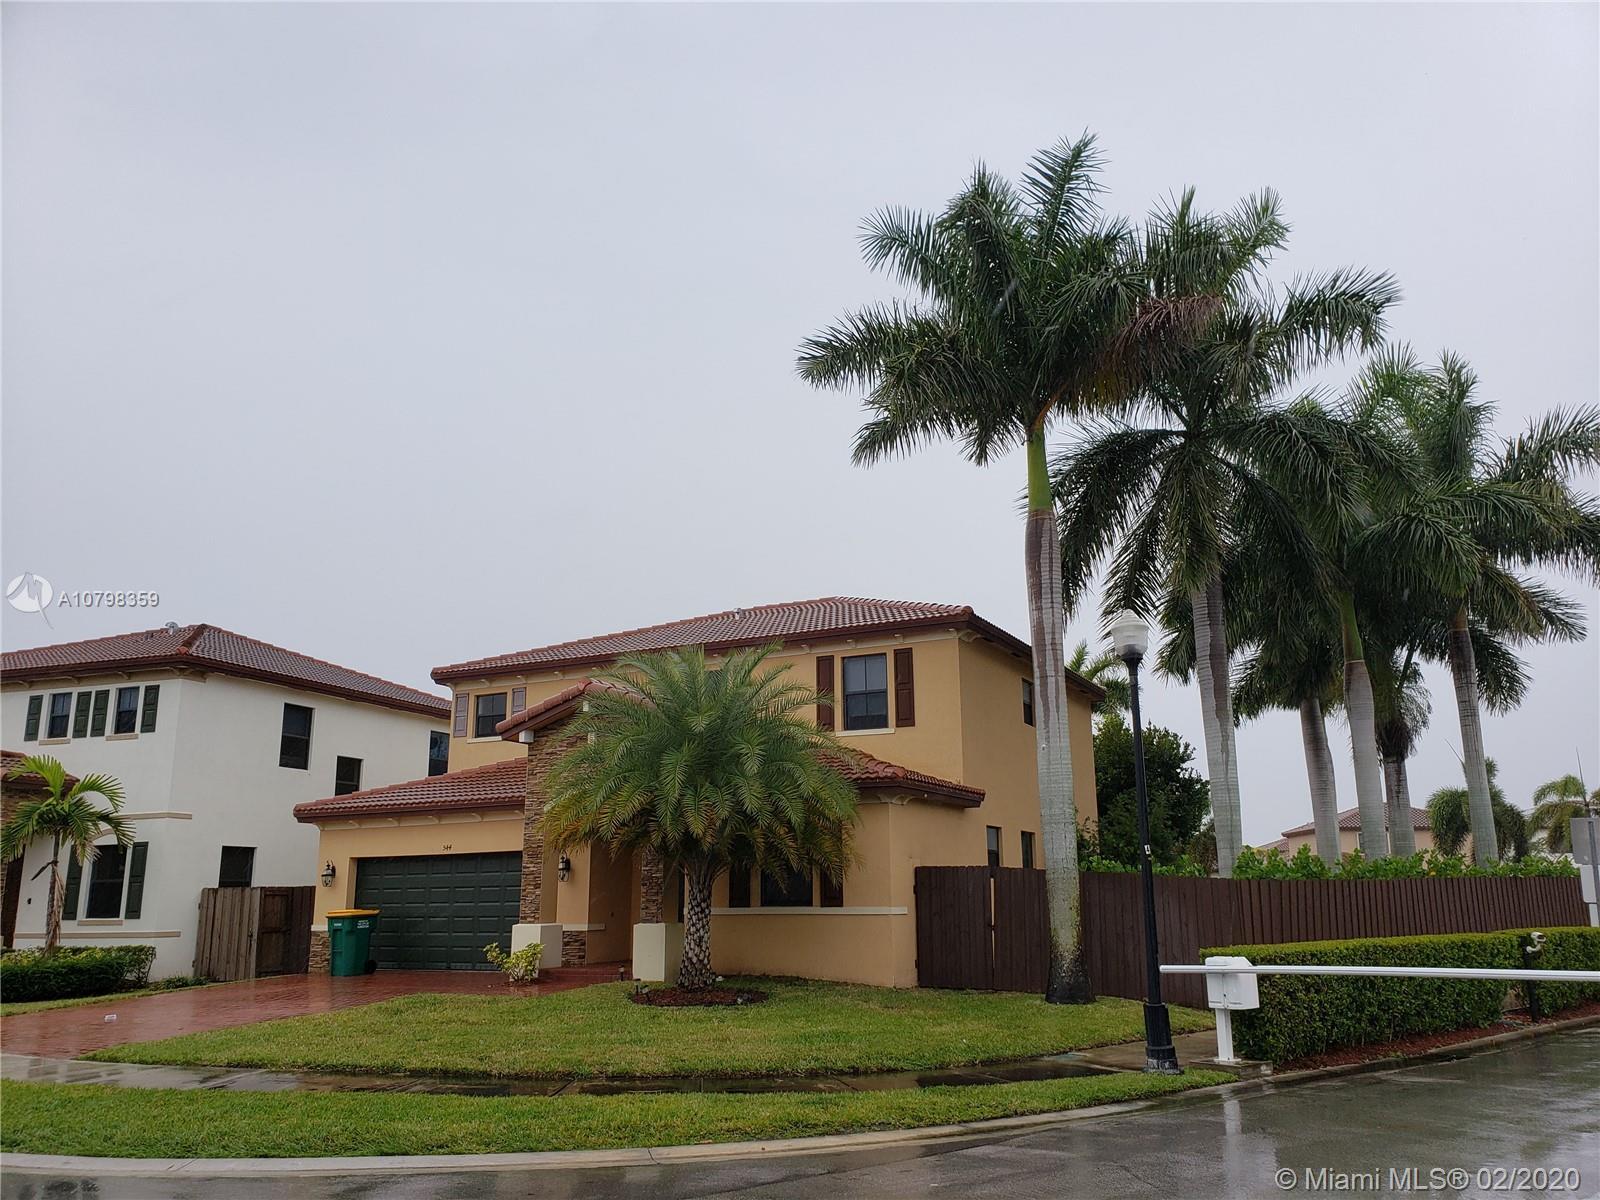 544 SE 37th Ave, Homestead, FL 33033 - Homestead, FL real estate listing